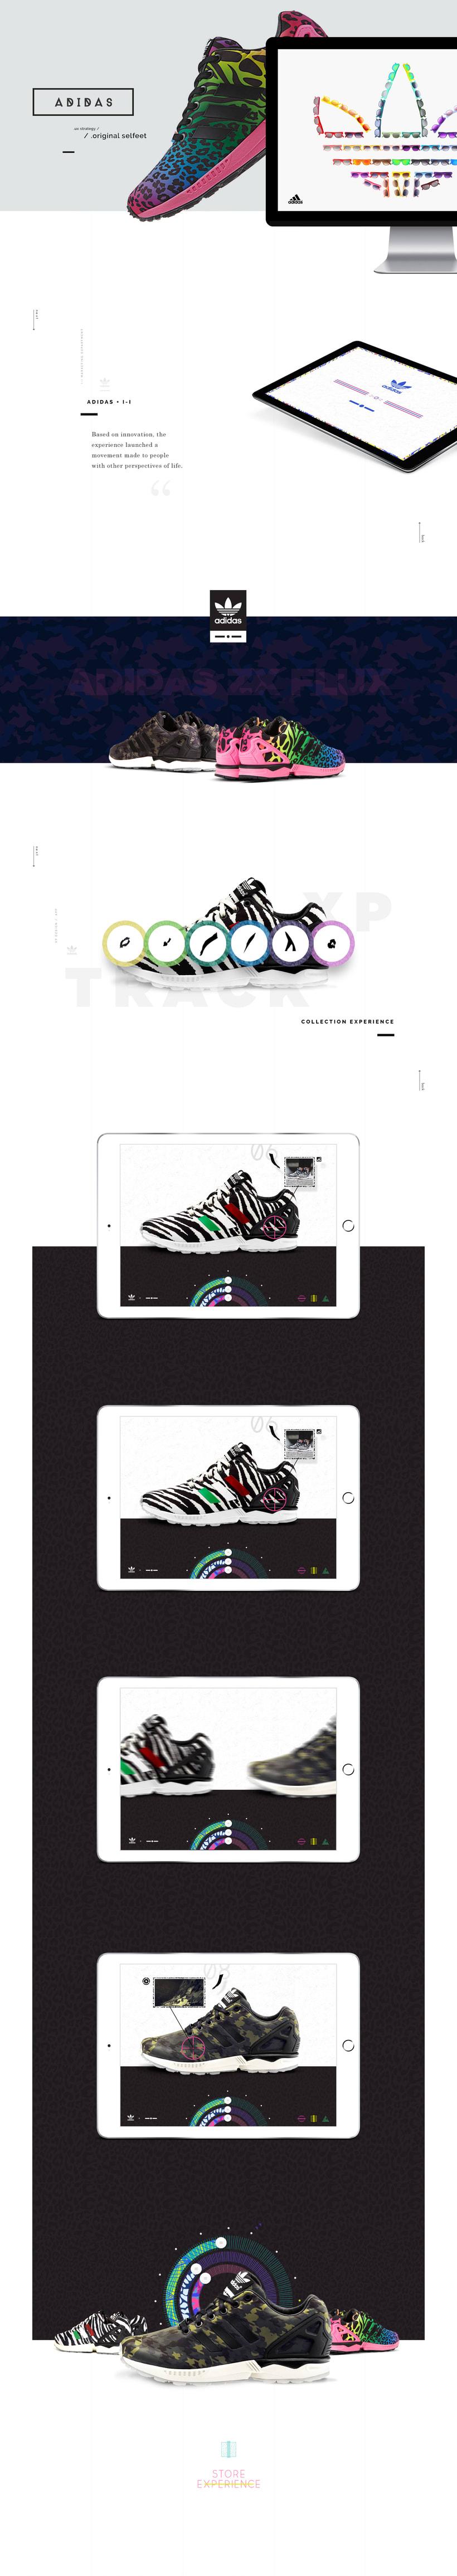 Adidas Original Selfeet | Full XP 0